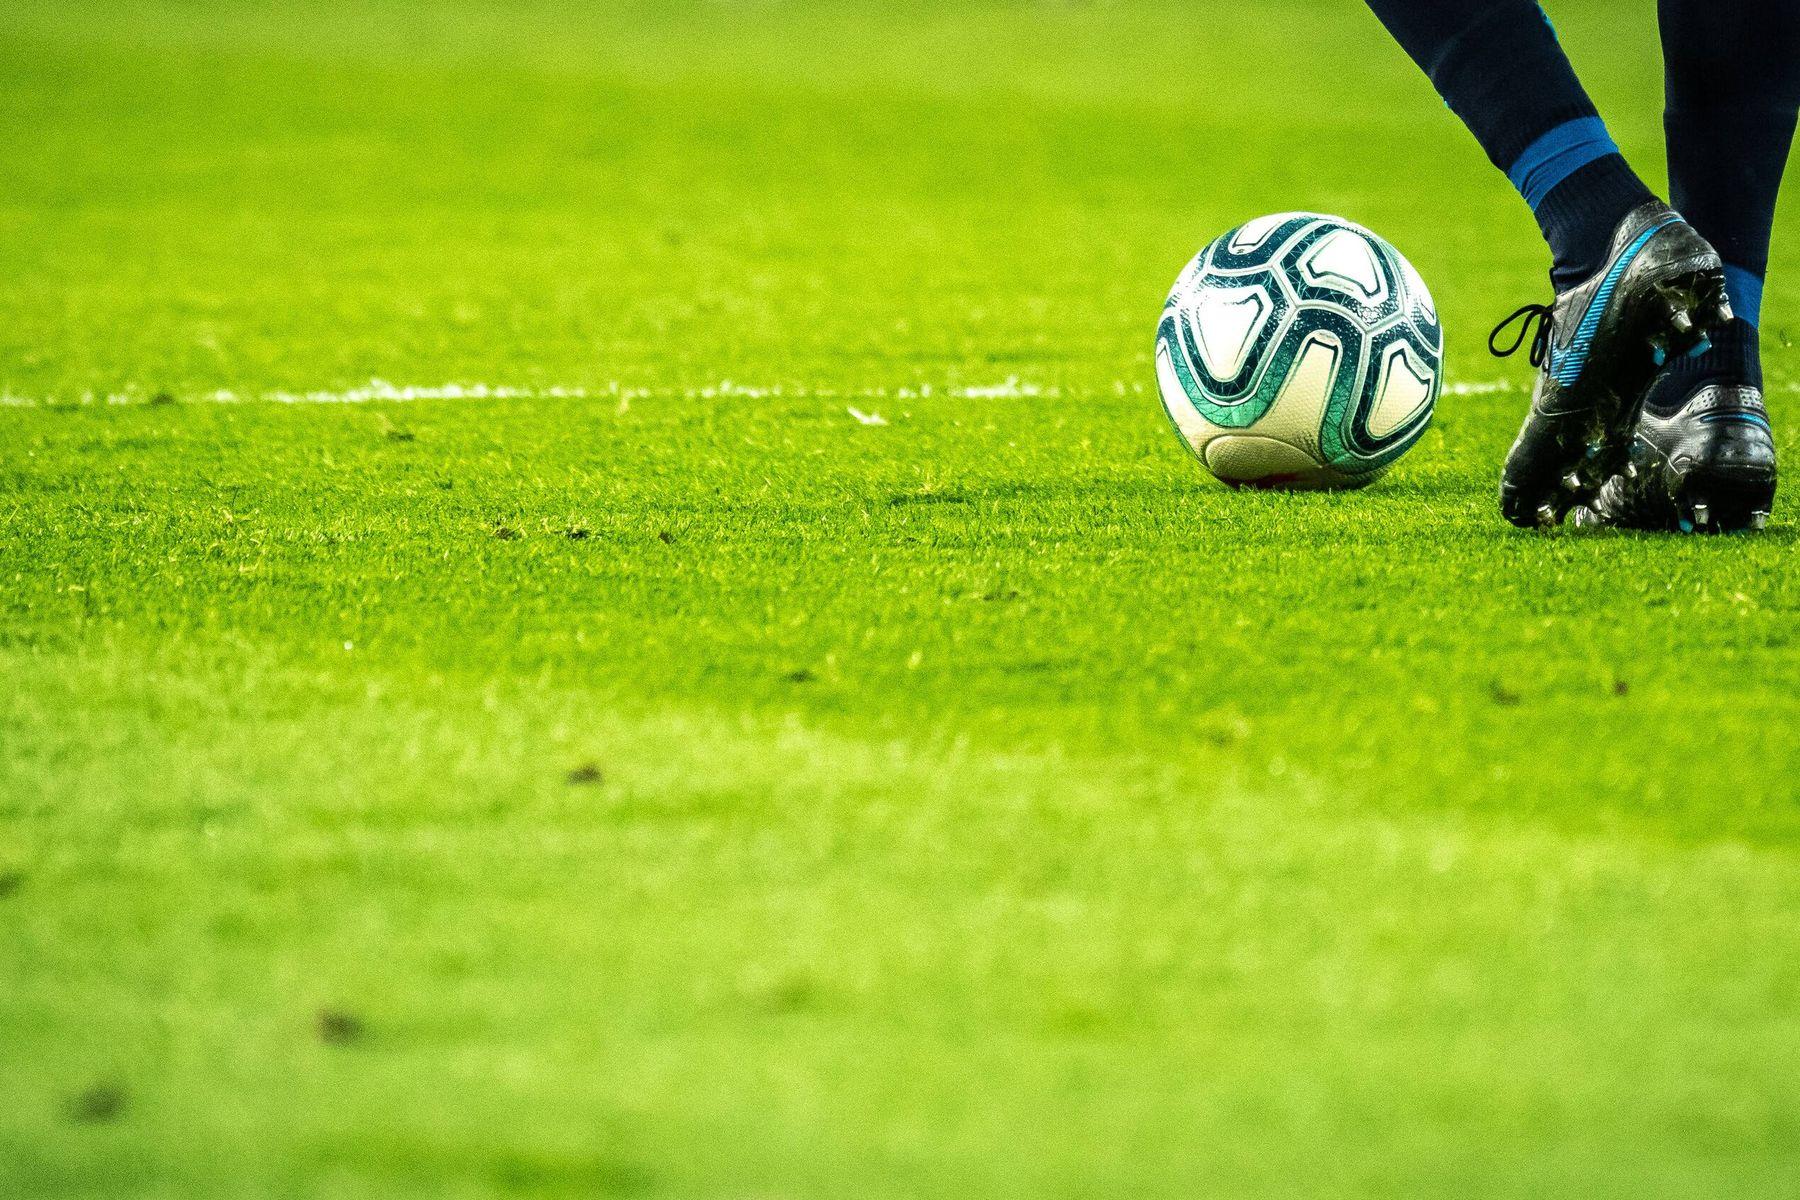 Fußballschuhe auf grünem Rasen